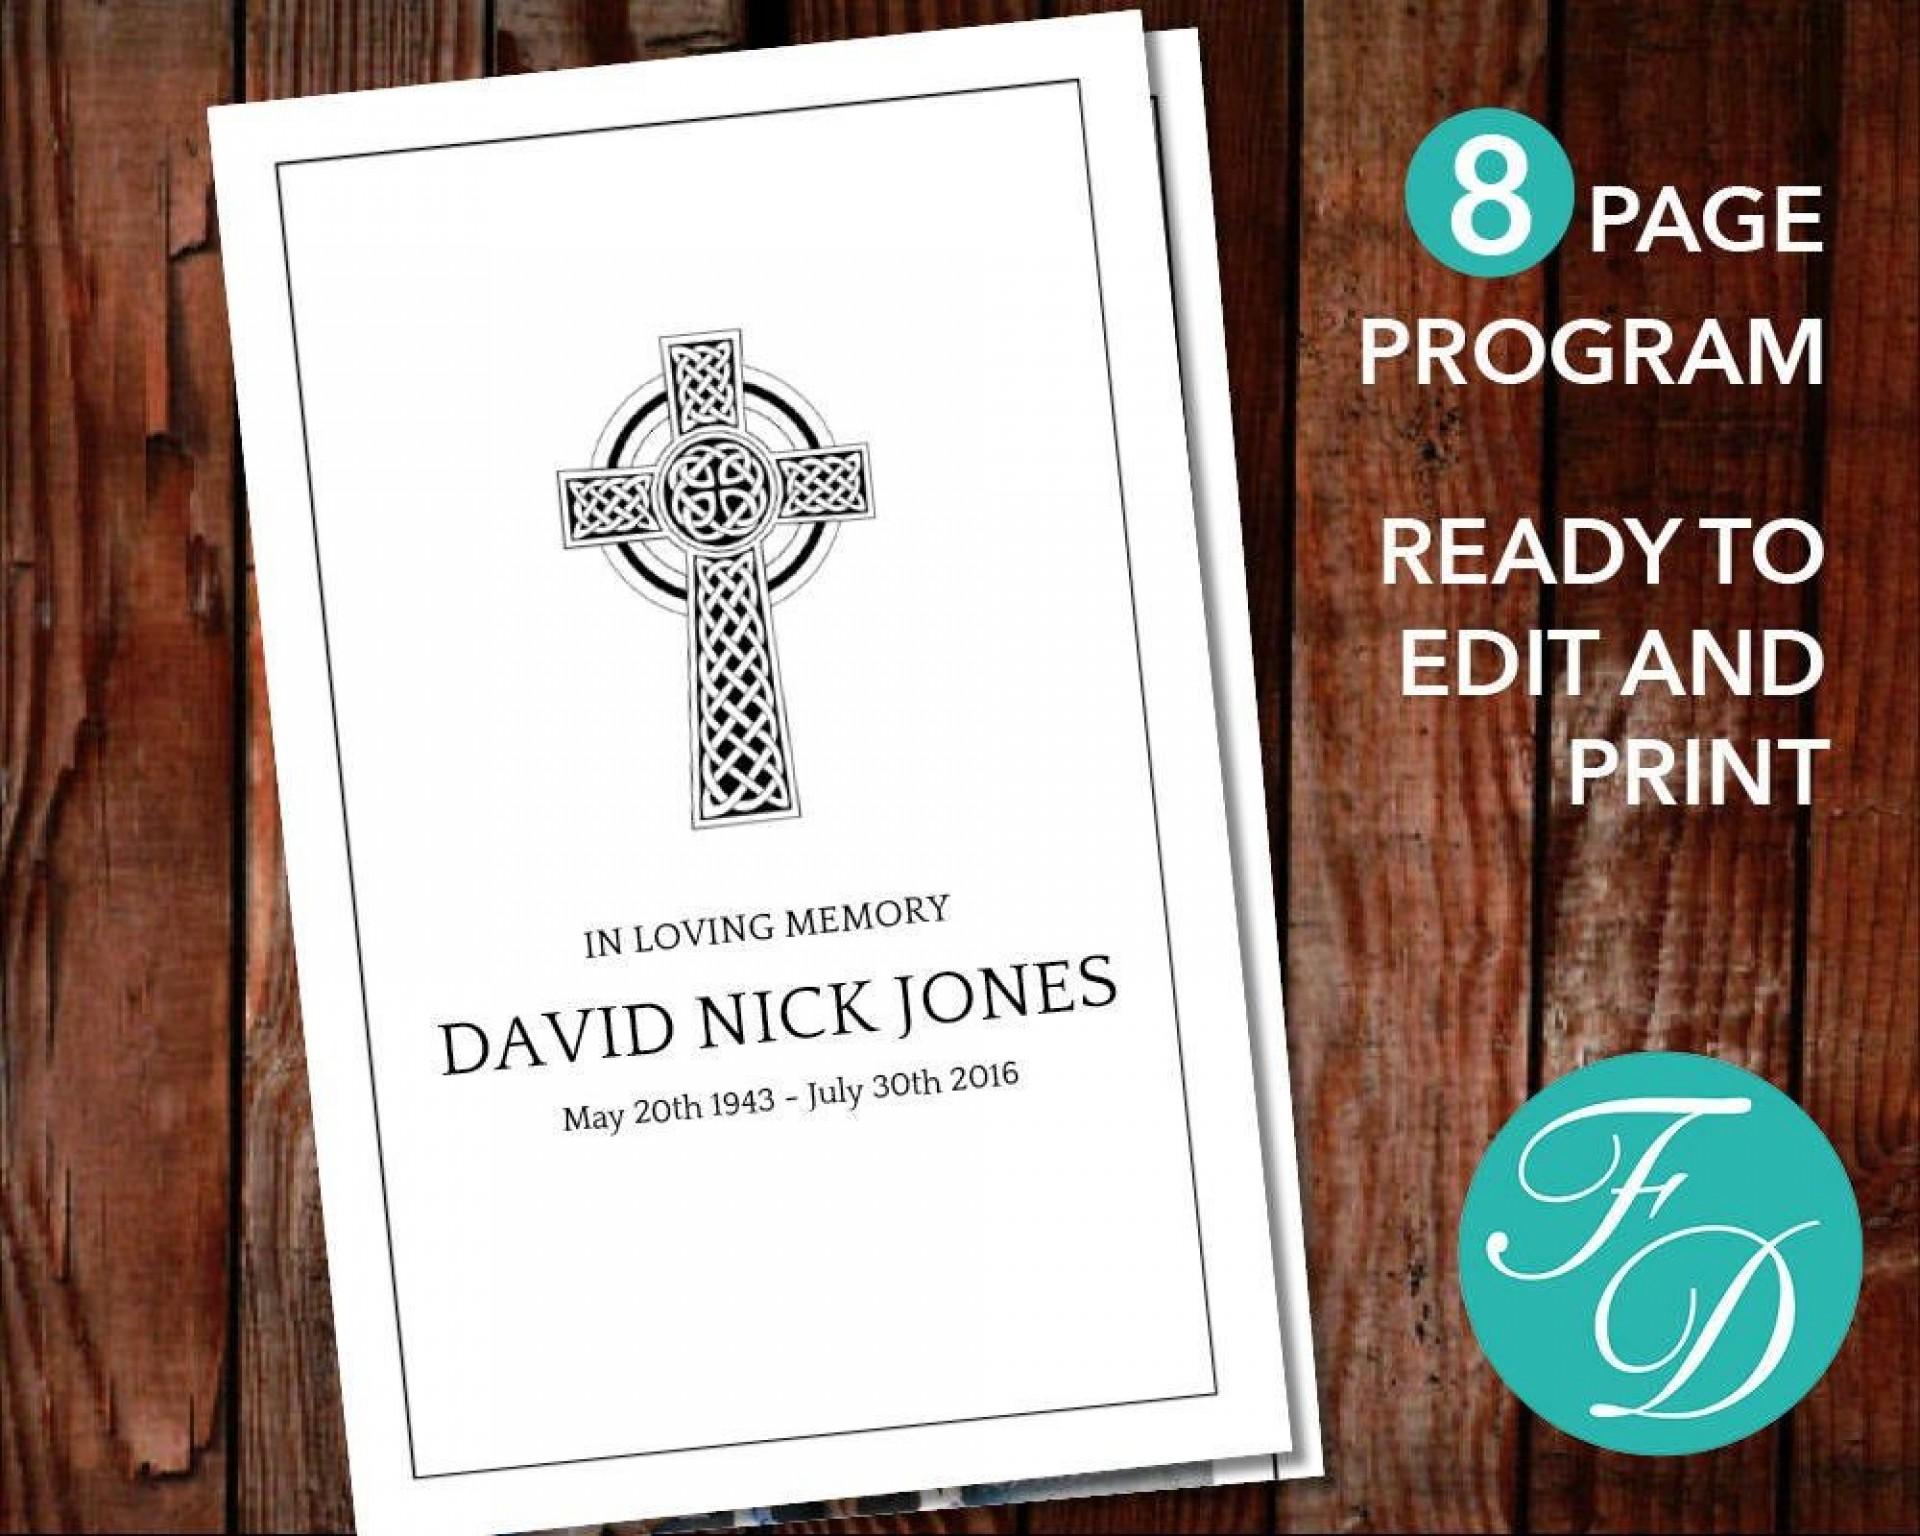 008 Sensational Catholic Funeral Program Template Highest Clarity  Mas Layout Free1920